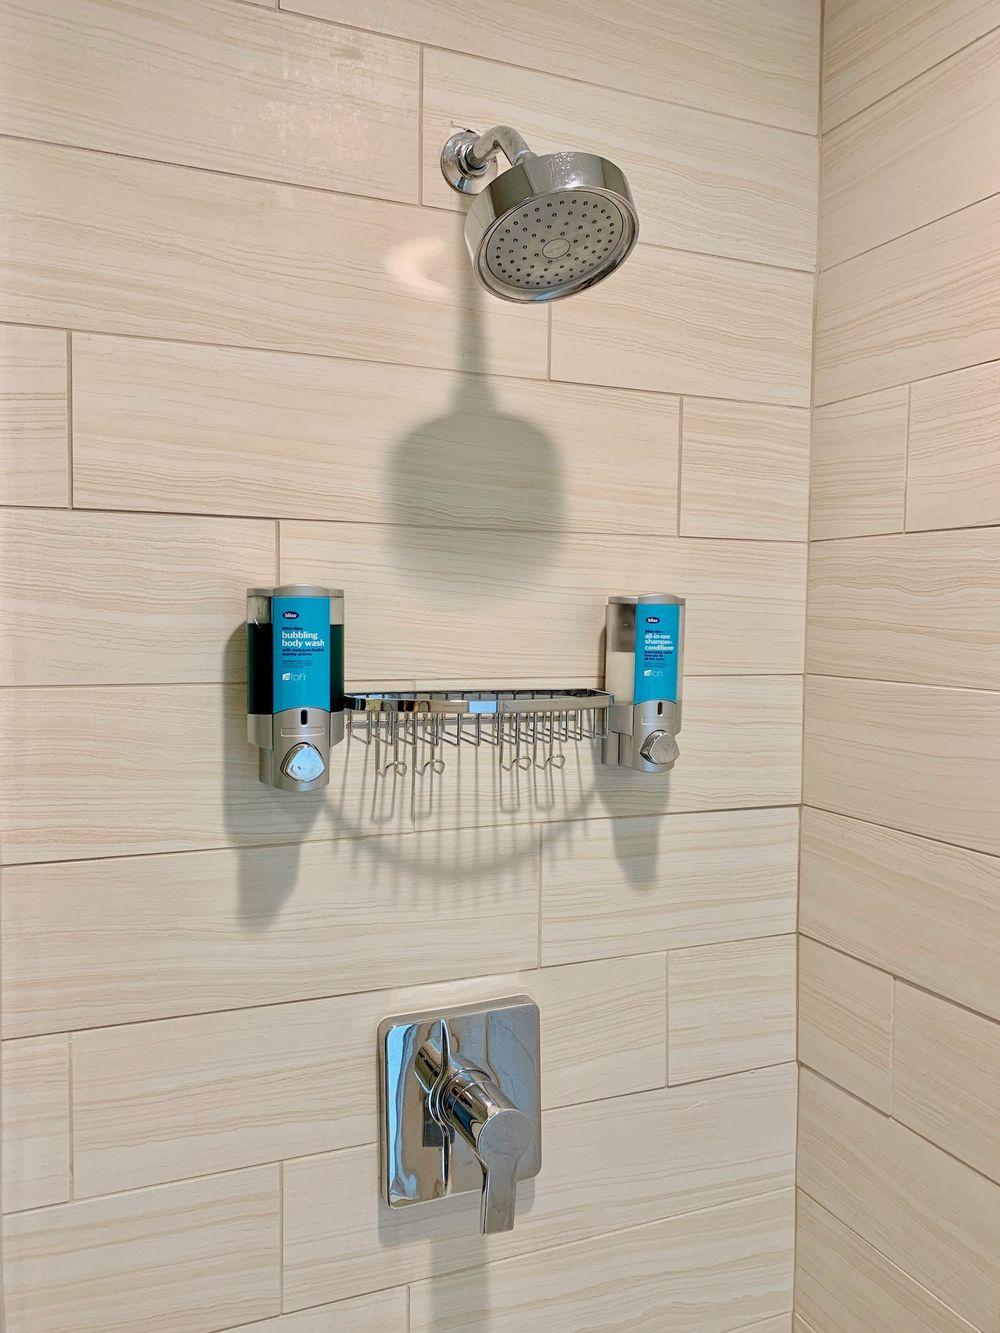 Shower at the Corpus Christi Aloft Hotel